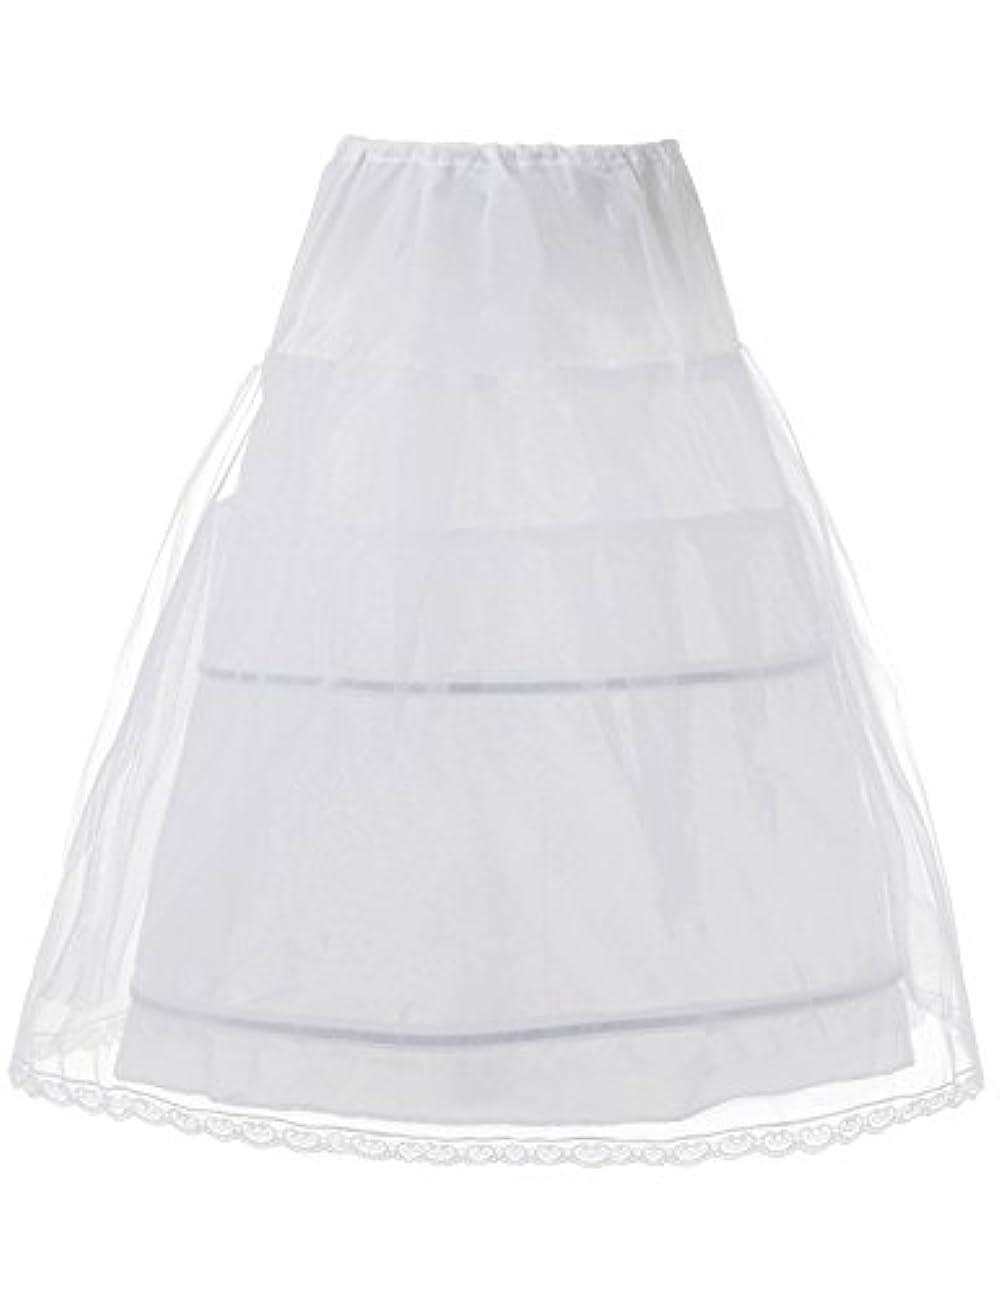 Remedios Kids Crinoline Petticoat Flower Girl Wedding Underskirt Slip, one size White